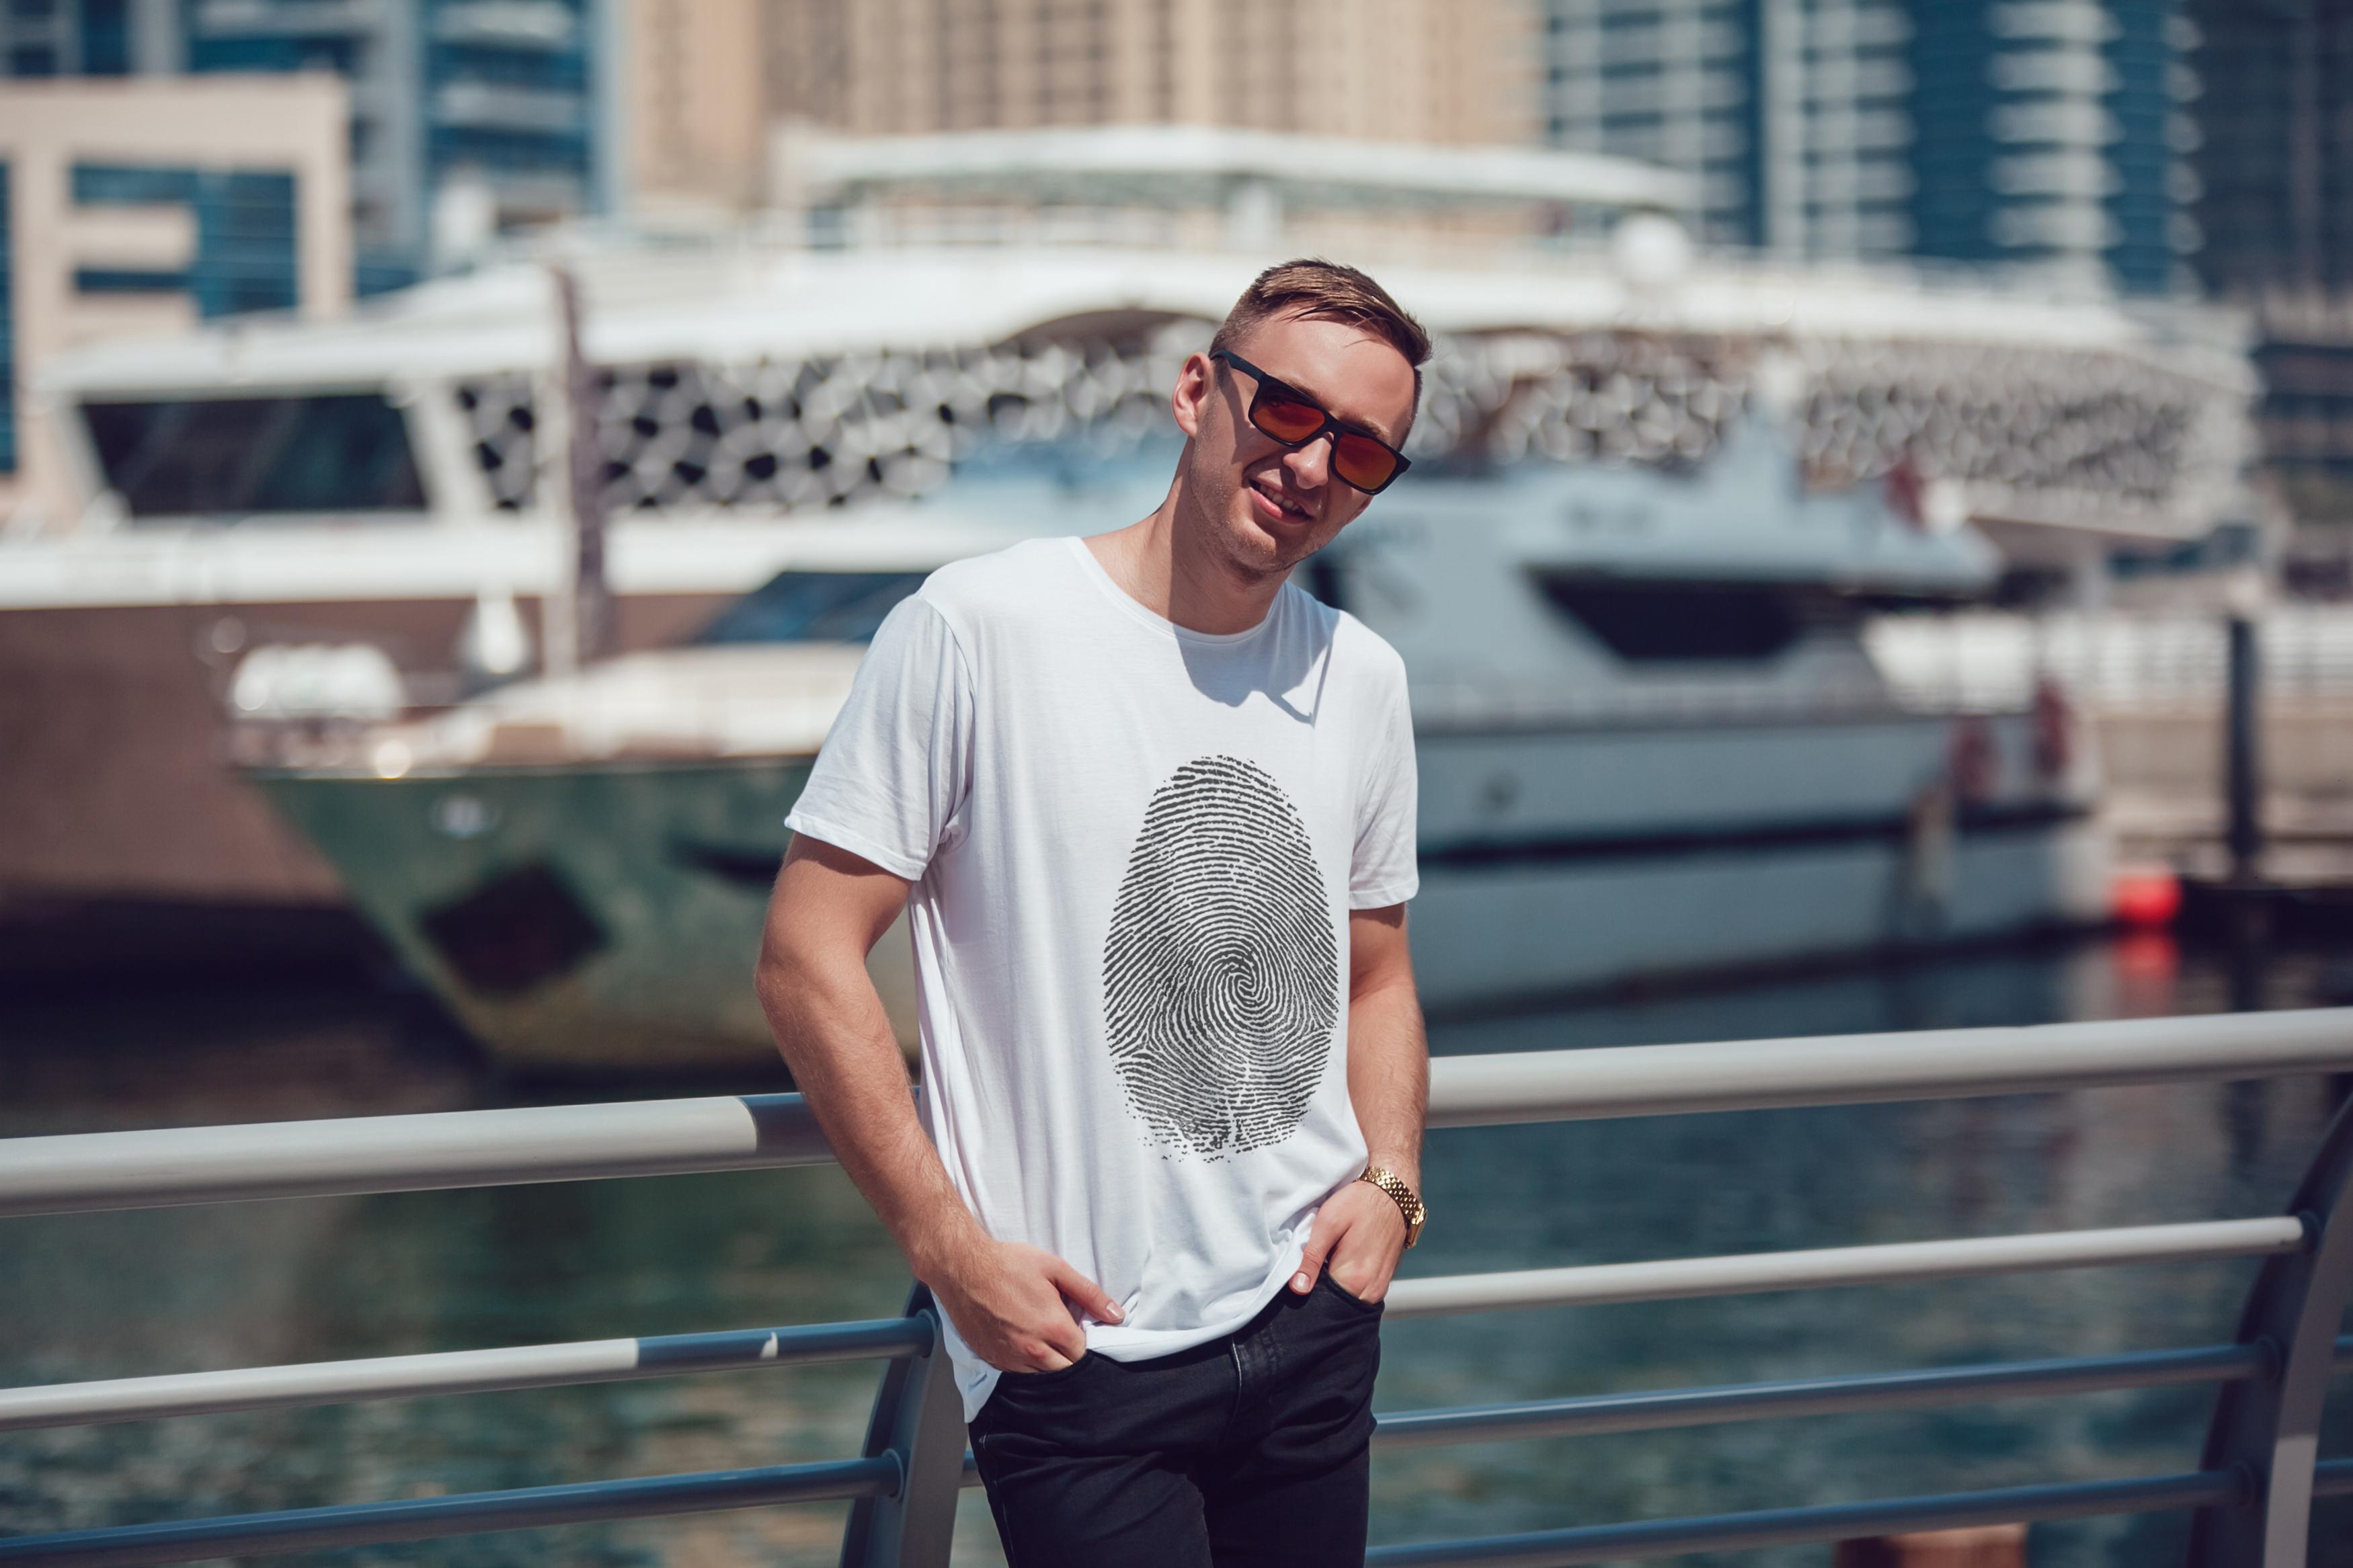 Men's T-Shirt Mock-Up Vol.5 2017 example image 17